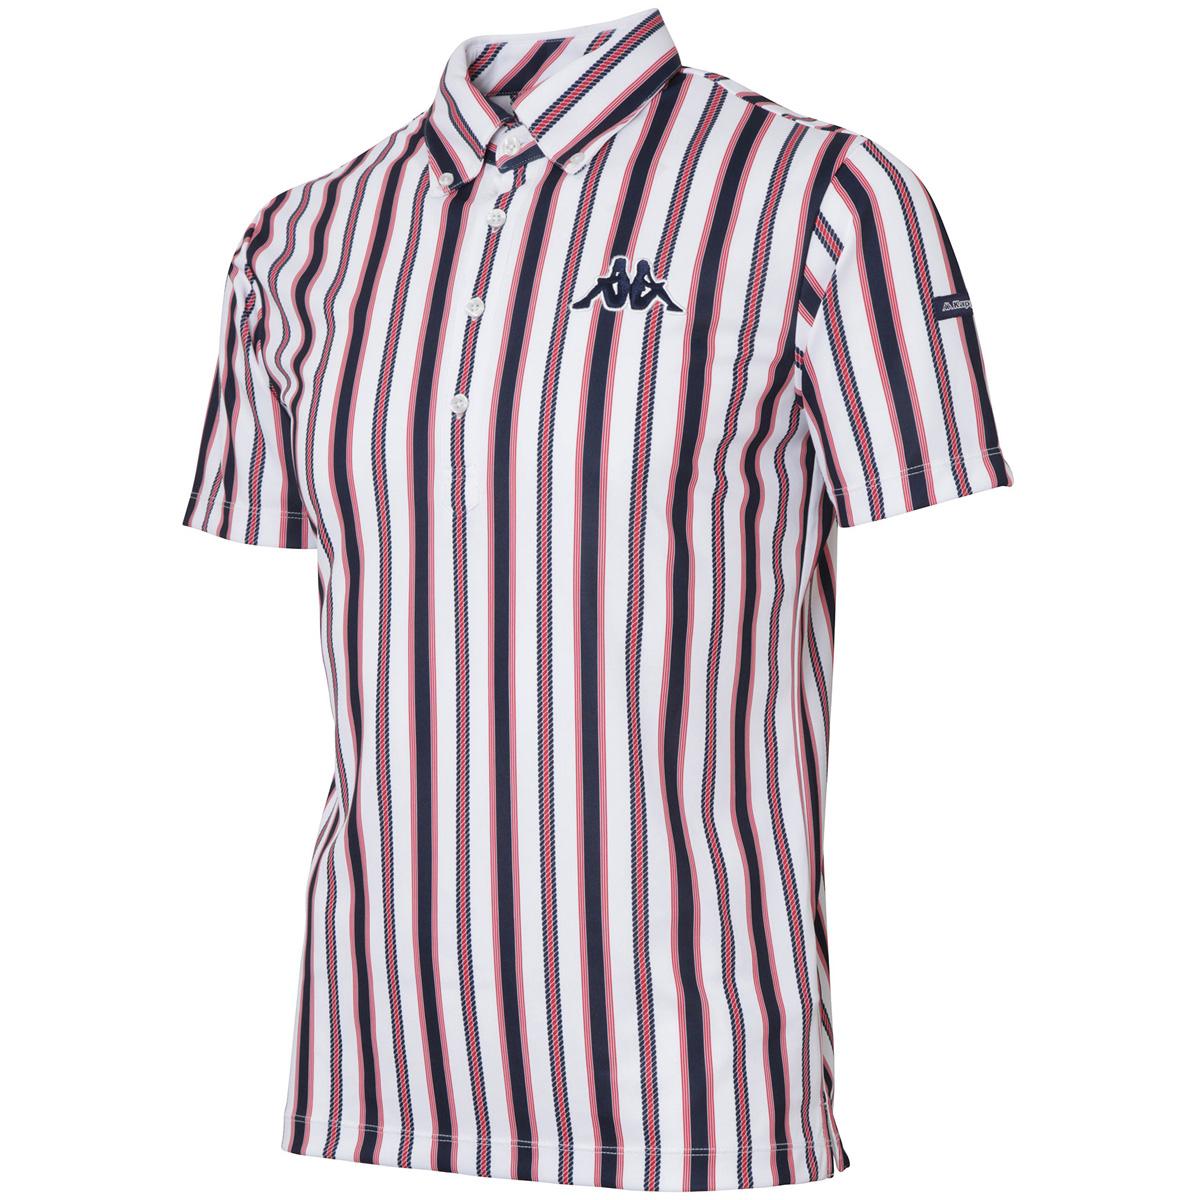 Kappa GOLF マルチストライプ半袖ポロシャツ